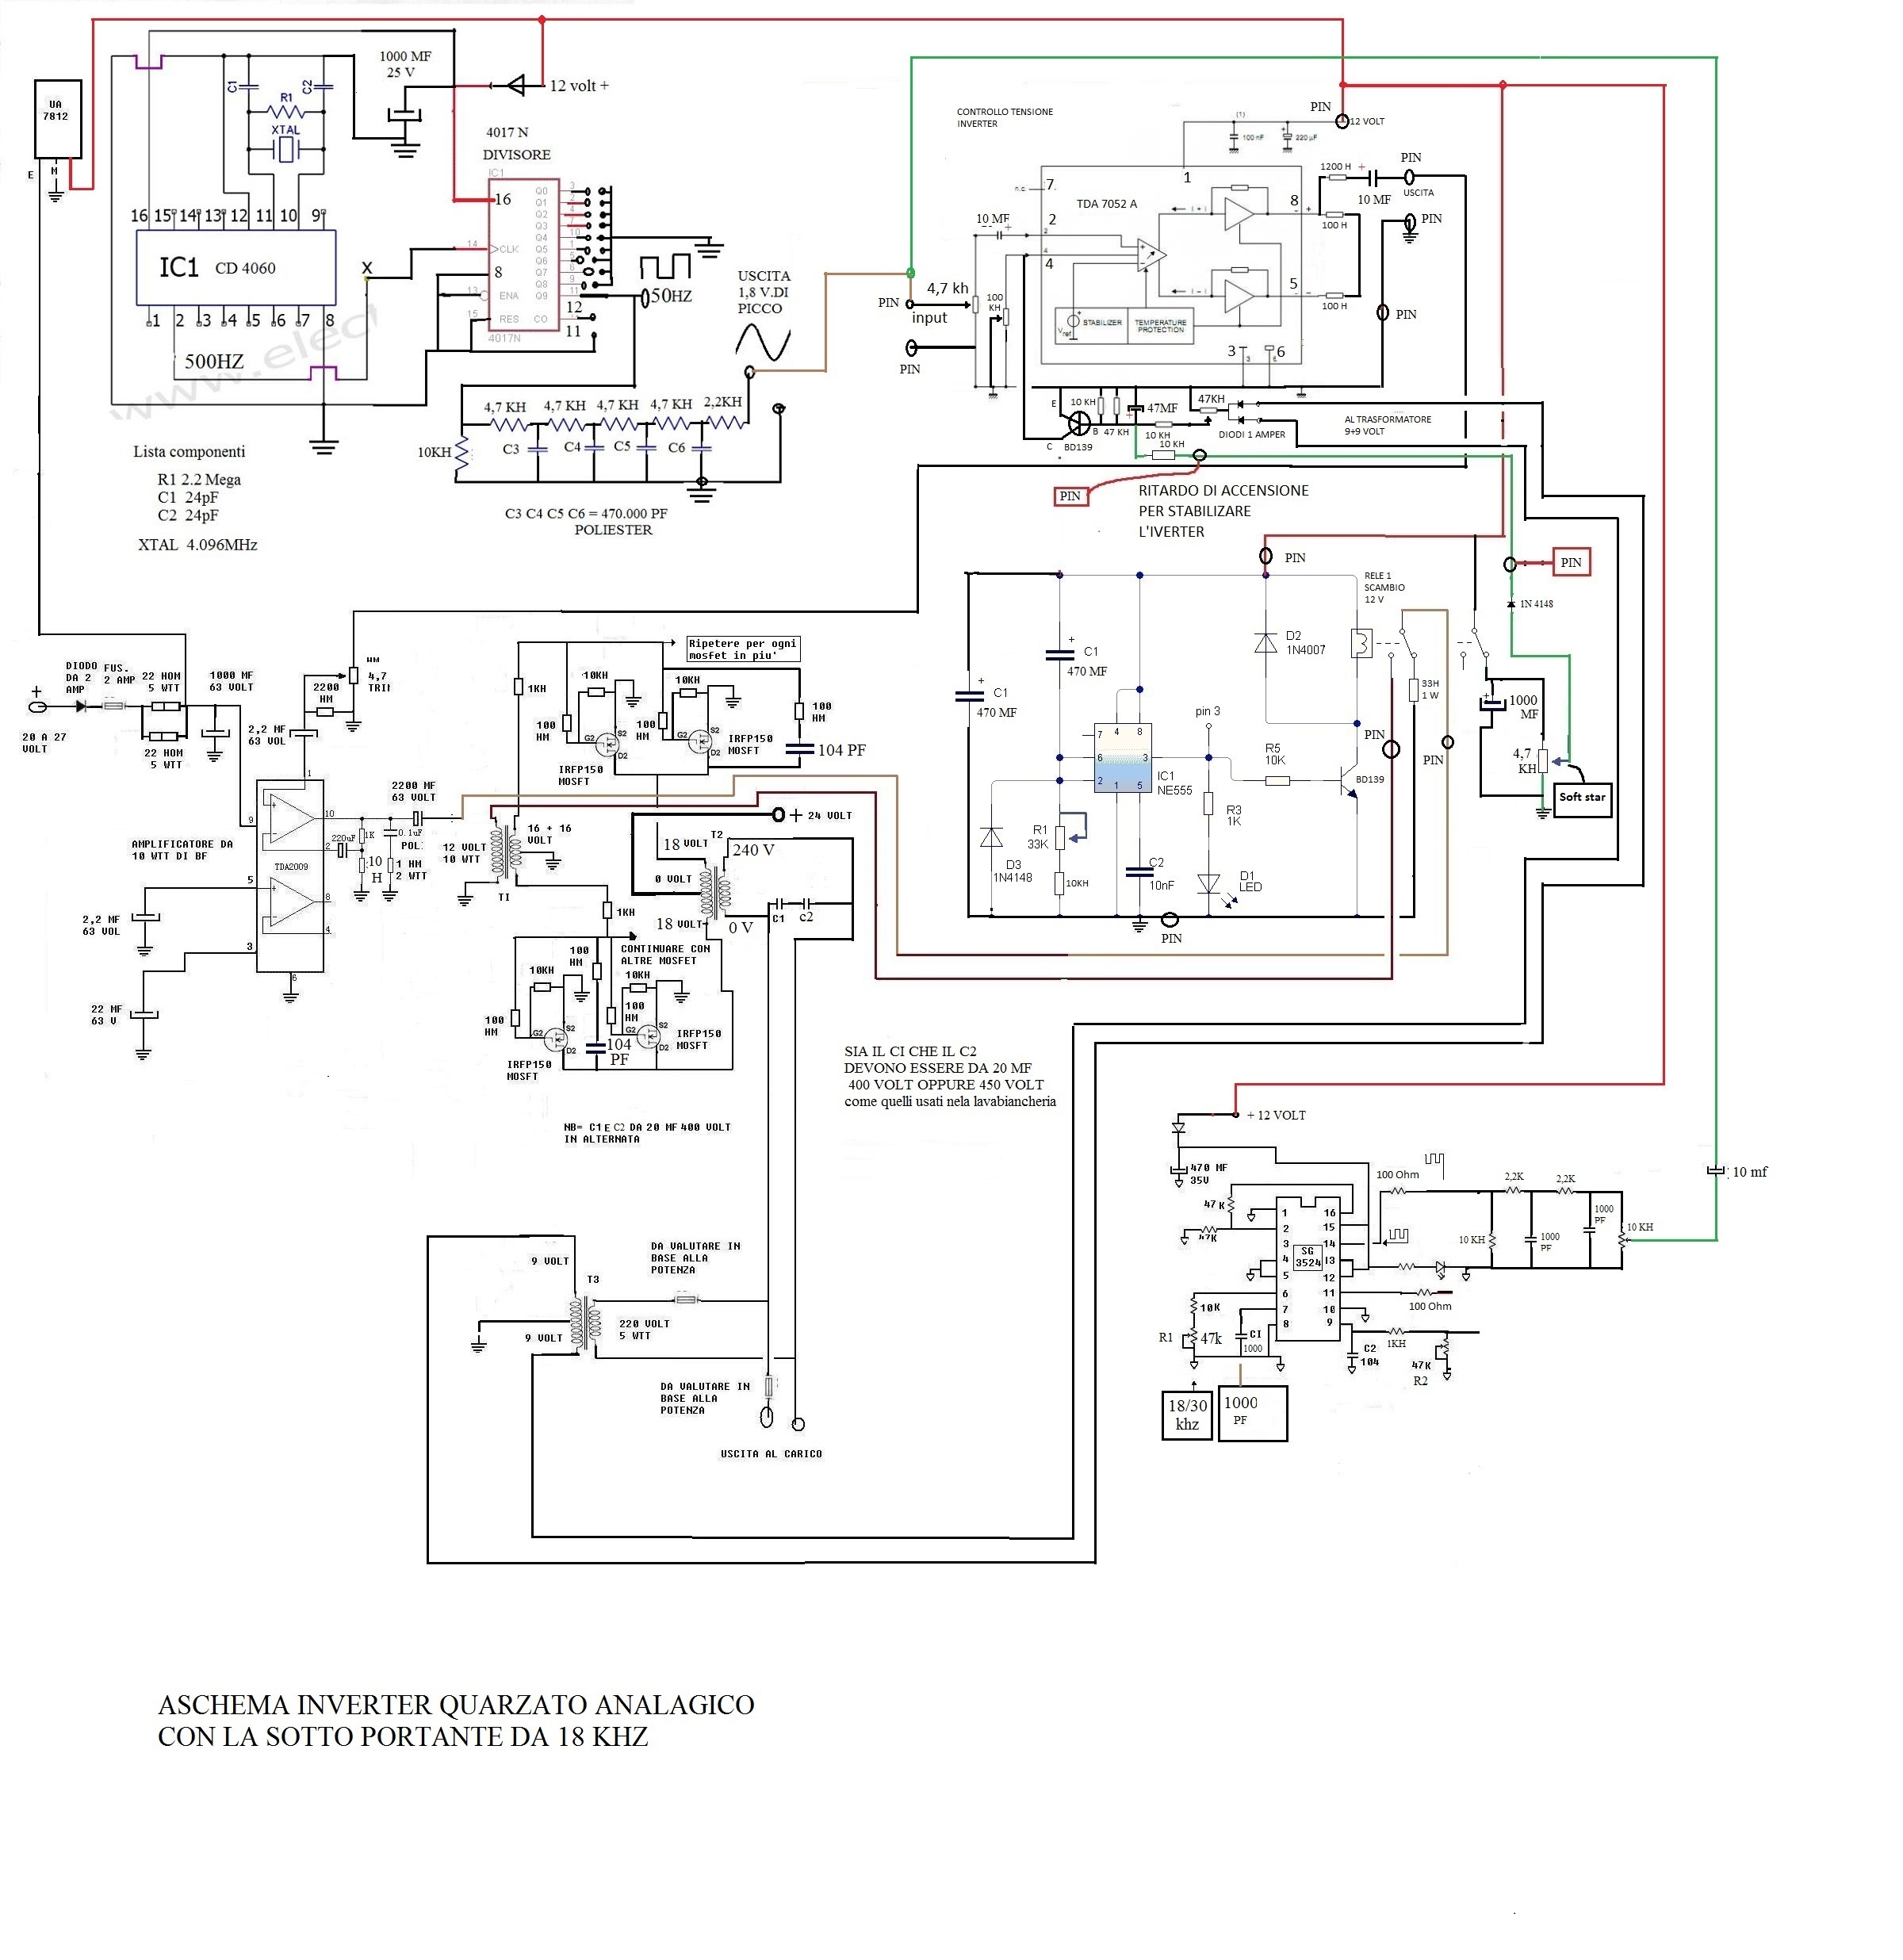 schema_inverter_a_onda_sinusoidale__1_001.jpg